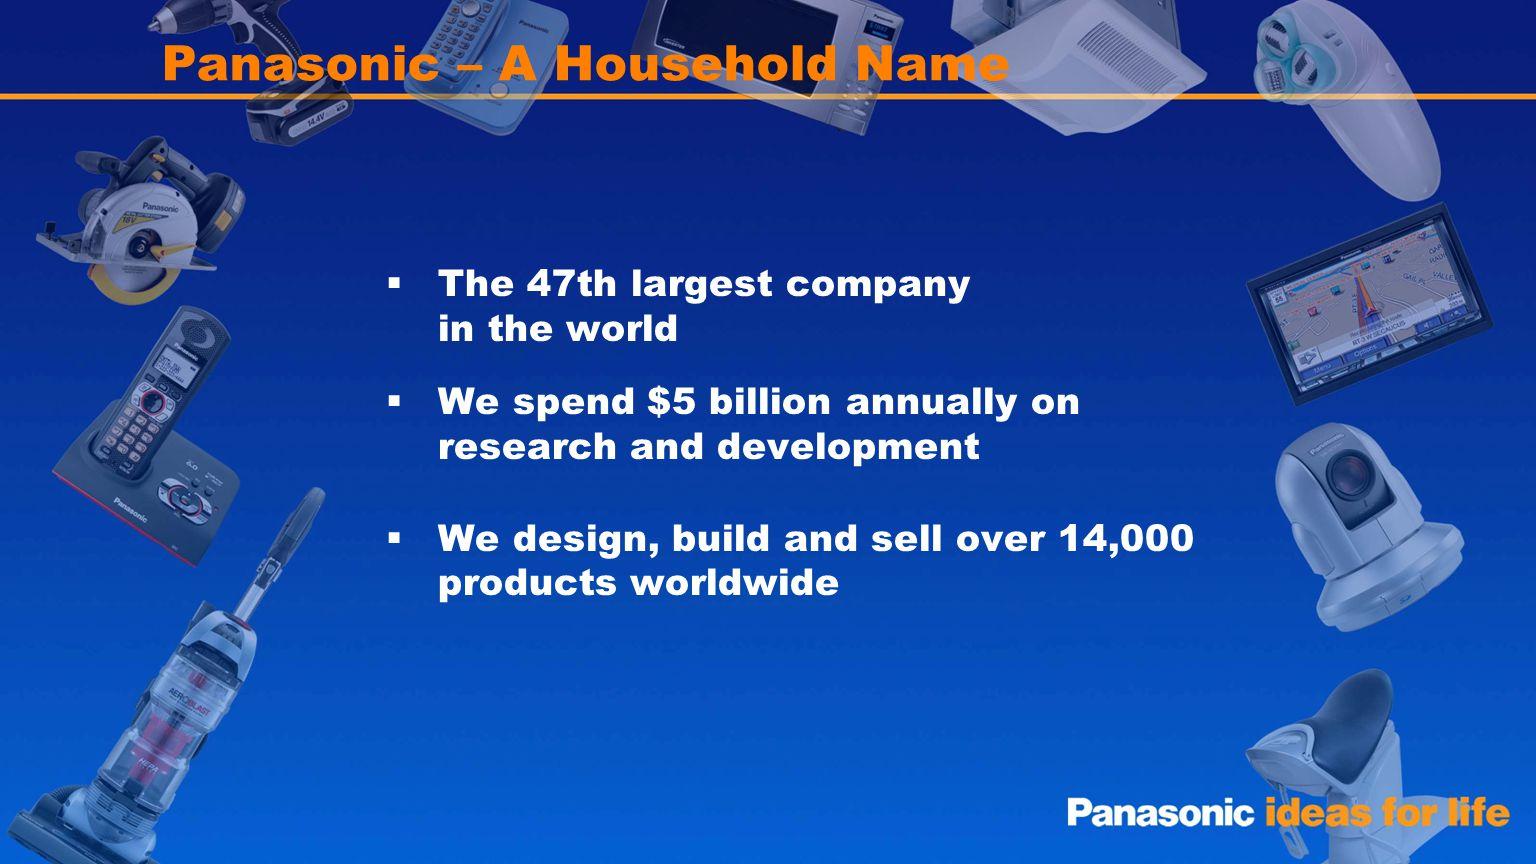 23 Panasonic – NetCam Transition (Dome Commercial) 2009200820072006 Varifocal Pan/Tilt M527A: $899 2.3x Auto Varifocal Rotation / Tilt Wide Angle Fixed Dome M403A: $649 Power Over Ethernet SD Card recording M547A: $1,099 Outdoor 2.3x Auto Varifocal Rotation / Tilt